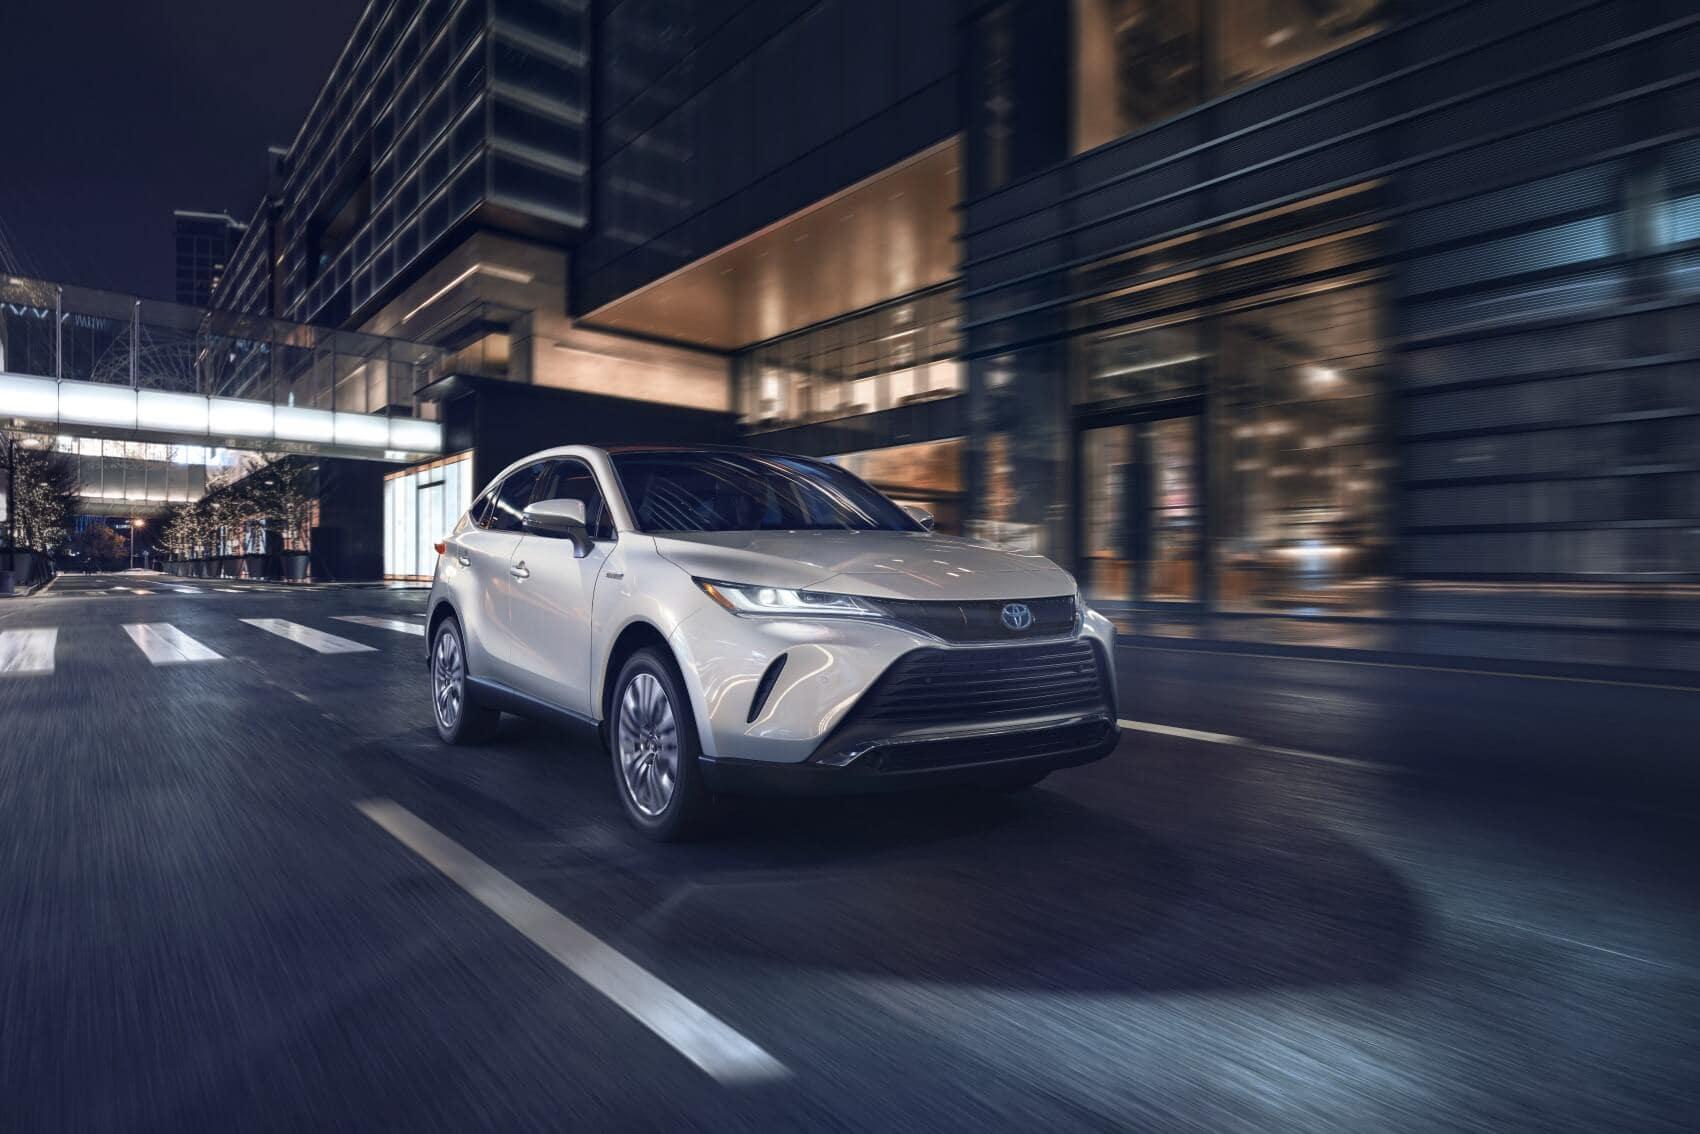 Toyota SUVs Venza